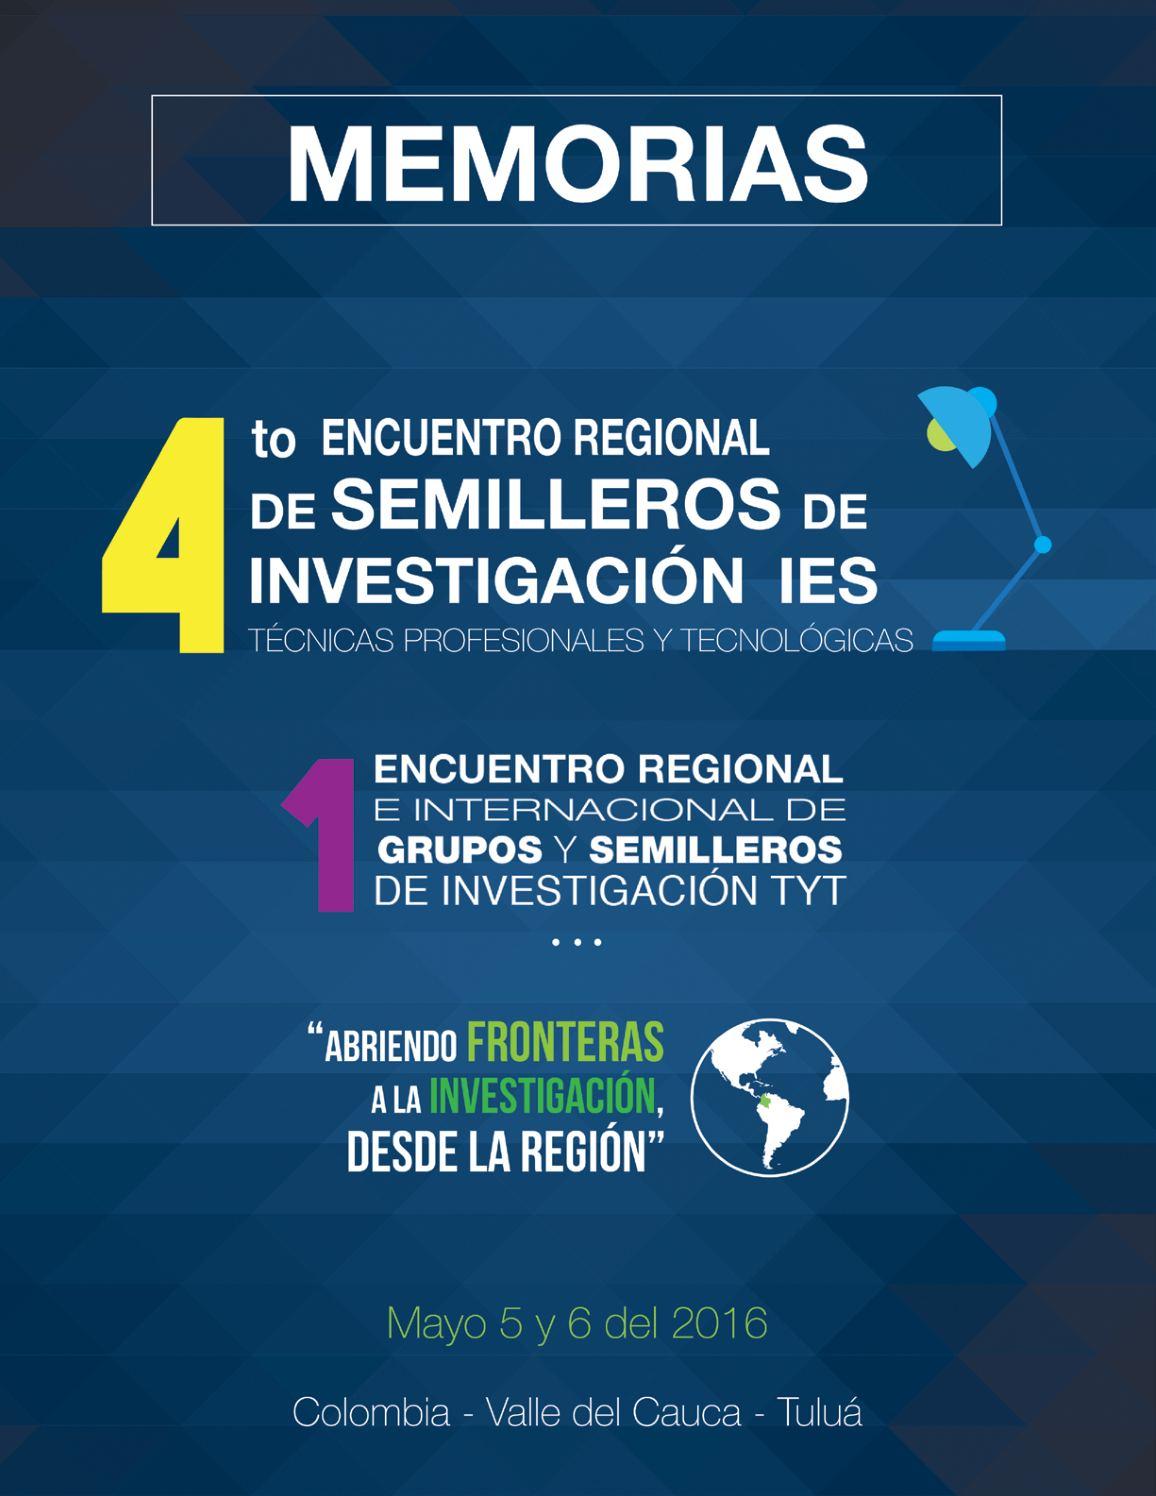 Calaméo - Memorias Cuarto Encuentro Semilleros Aciet dfa0a95bb4ad